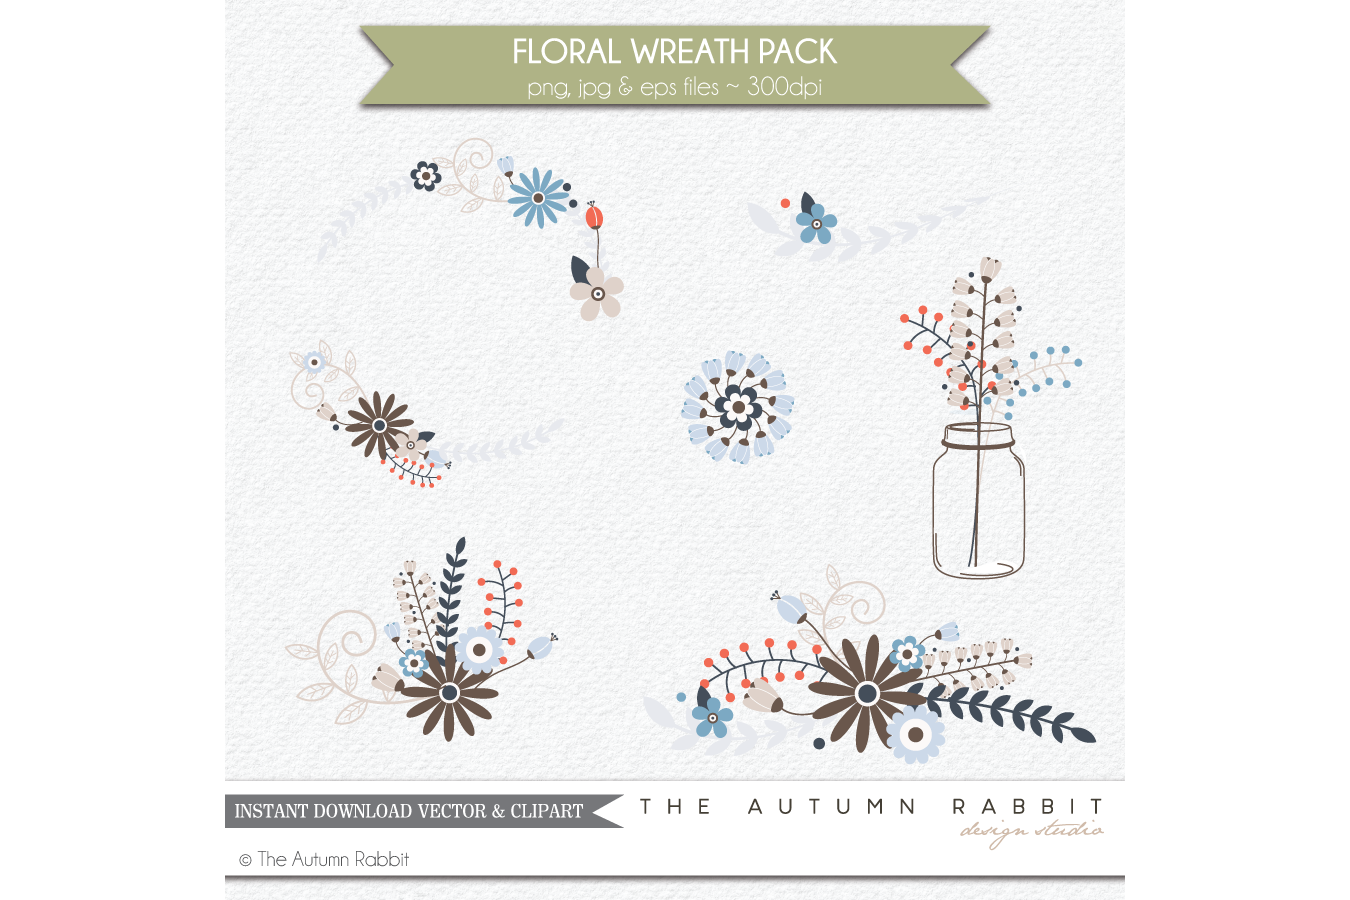 Floral Wreath Clipart Vectors example image 2